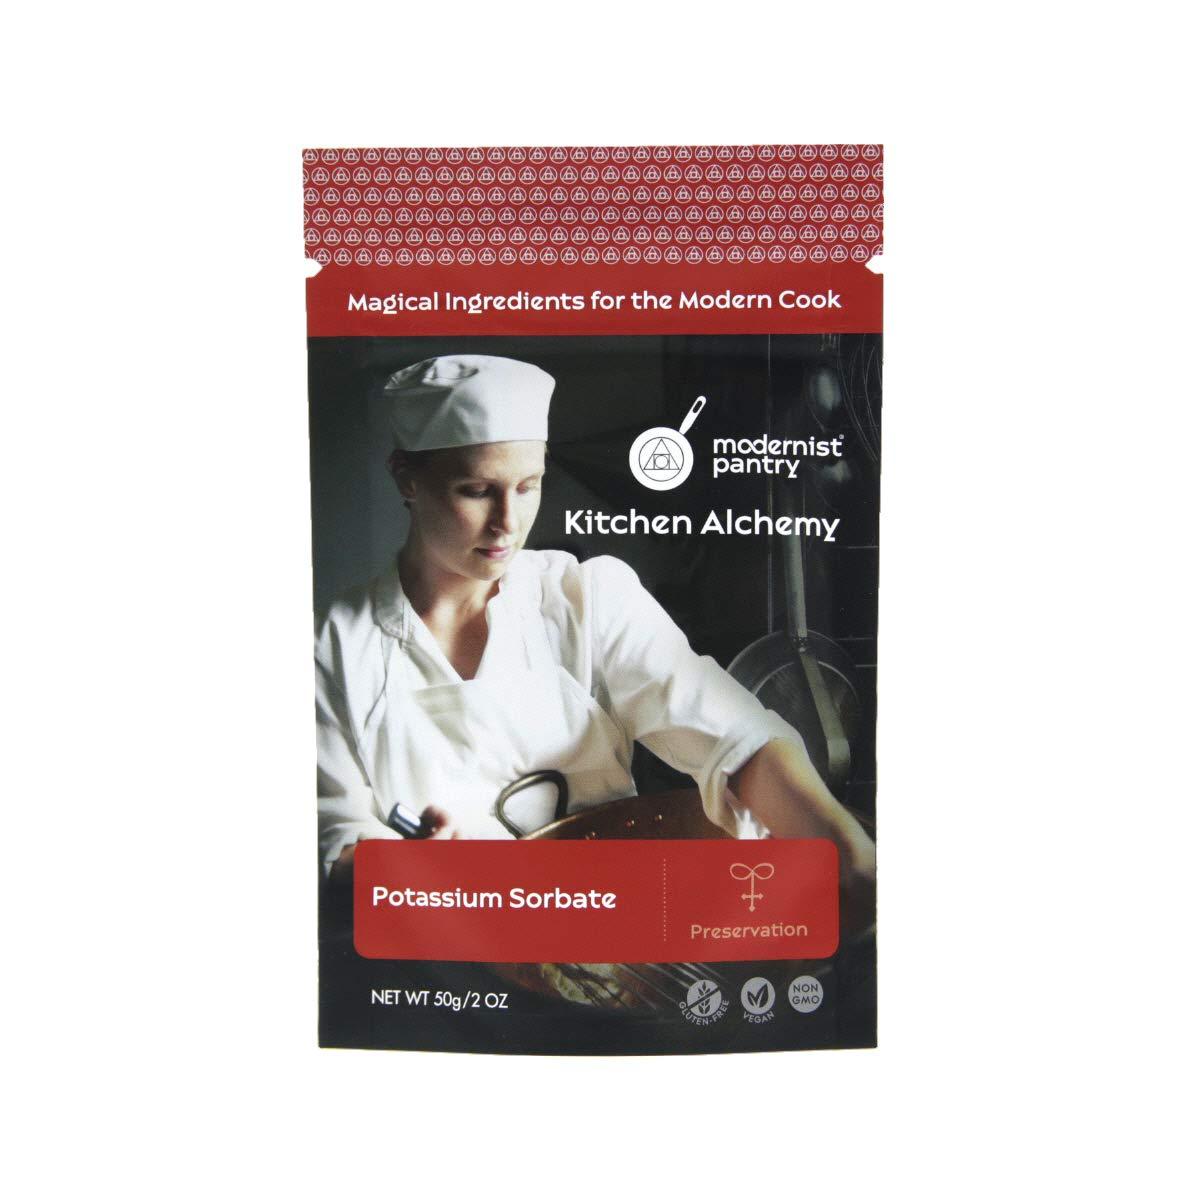 Pure Potassium Sorbate ⊘ Non-GMO ❤ Gluten-Free ☮ Vegan - 50g/2oz